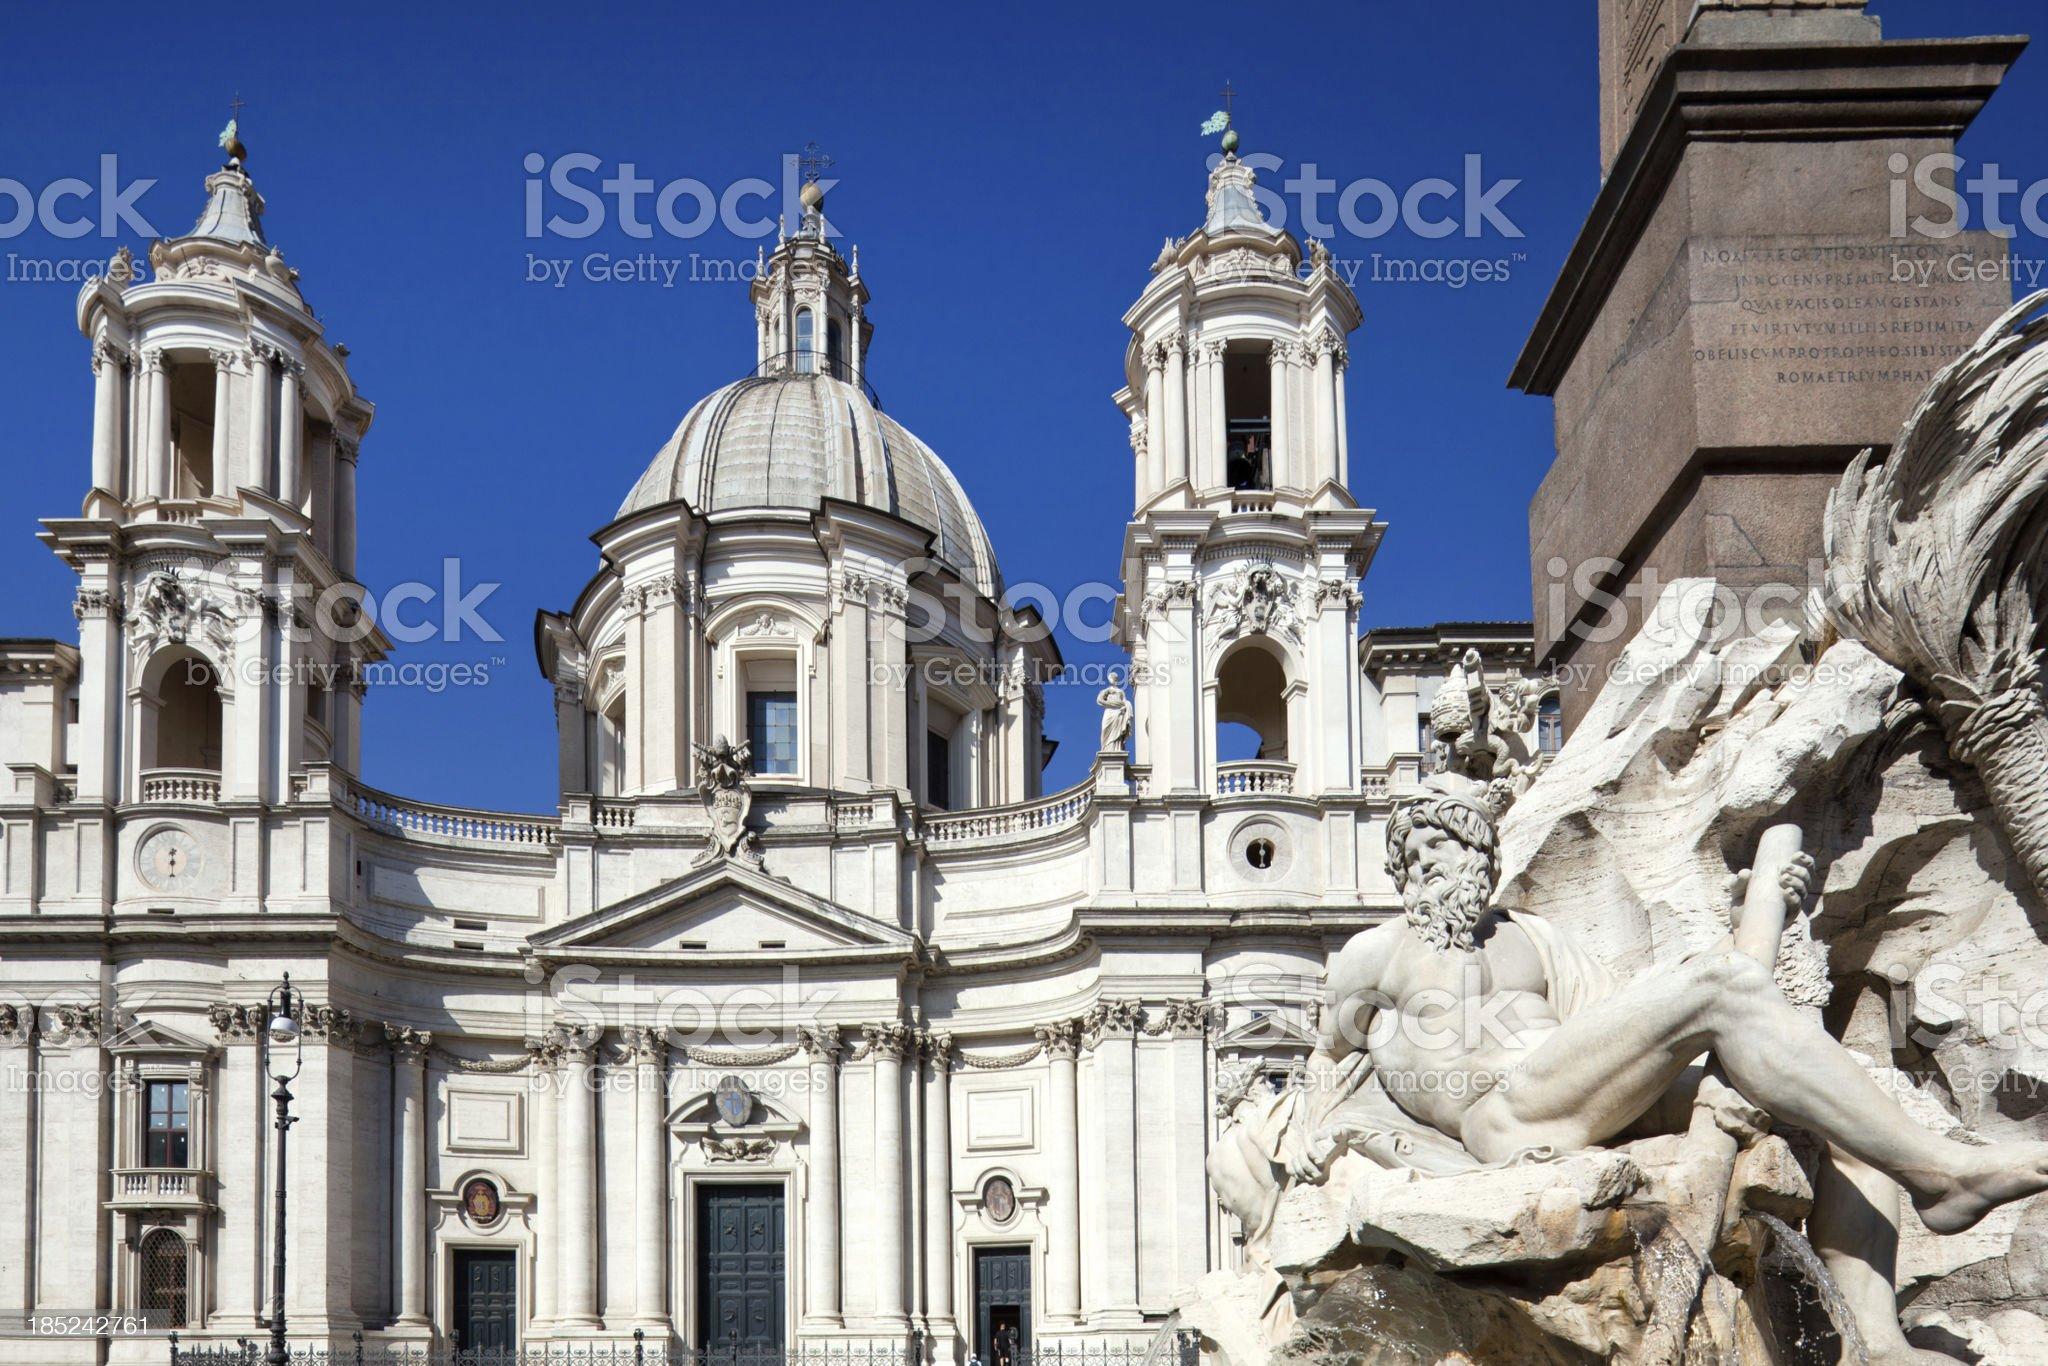 Neptune Fountain in Rome, Italy royalty-free stock photo